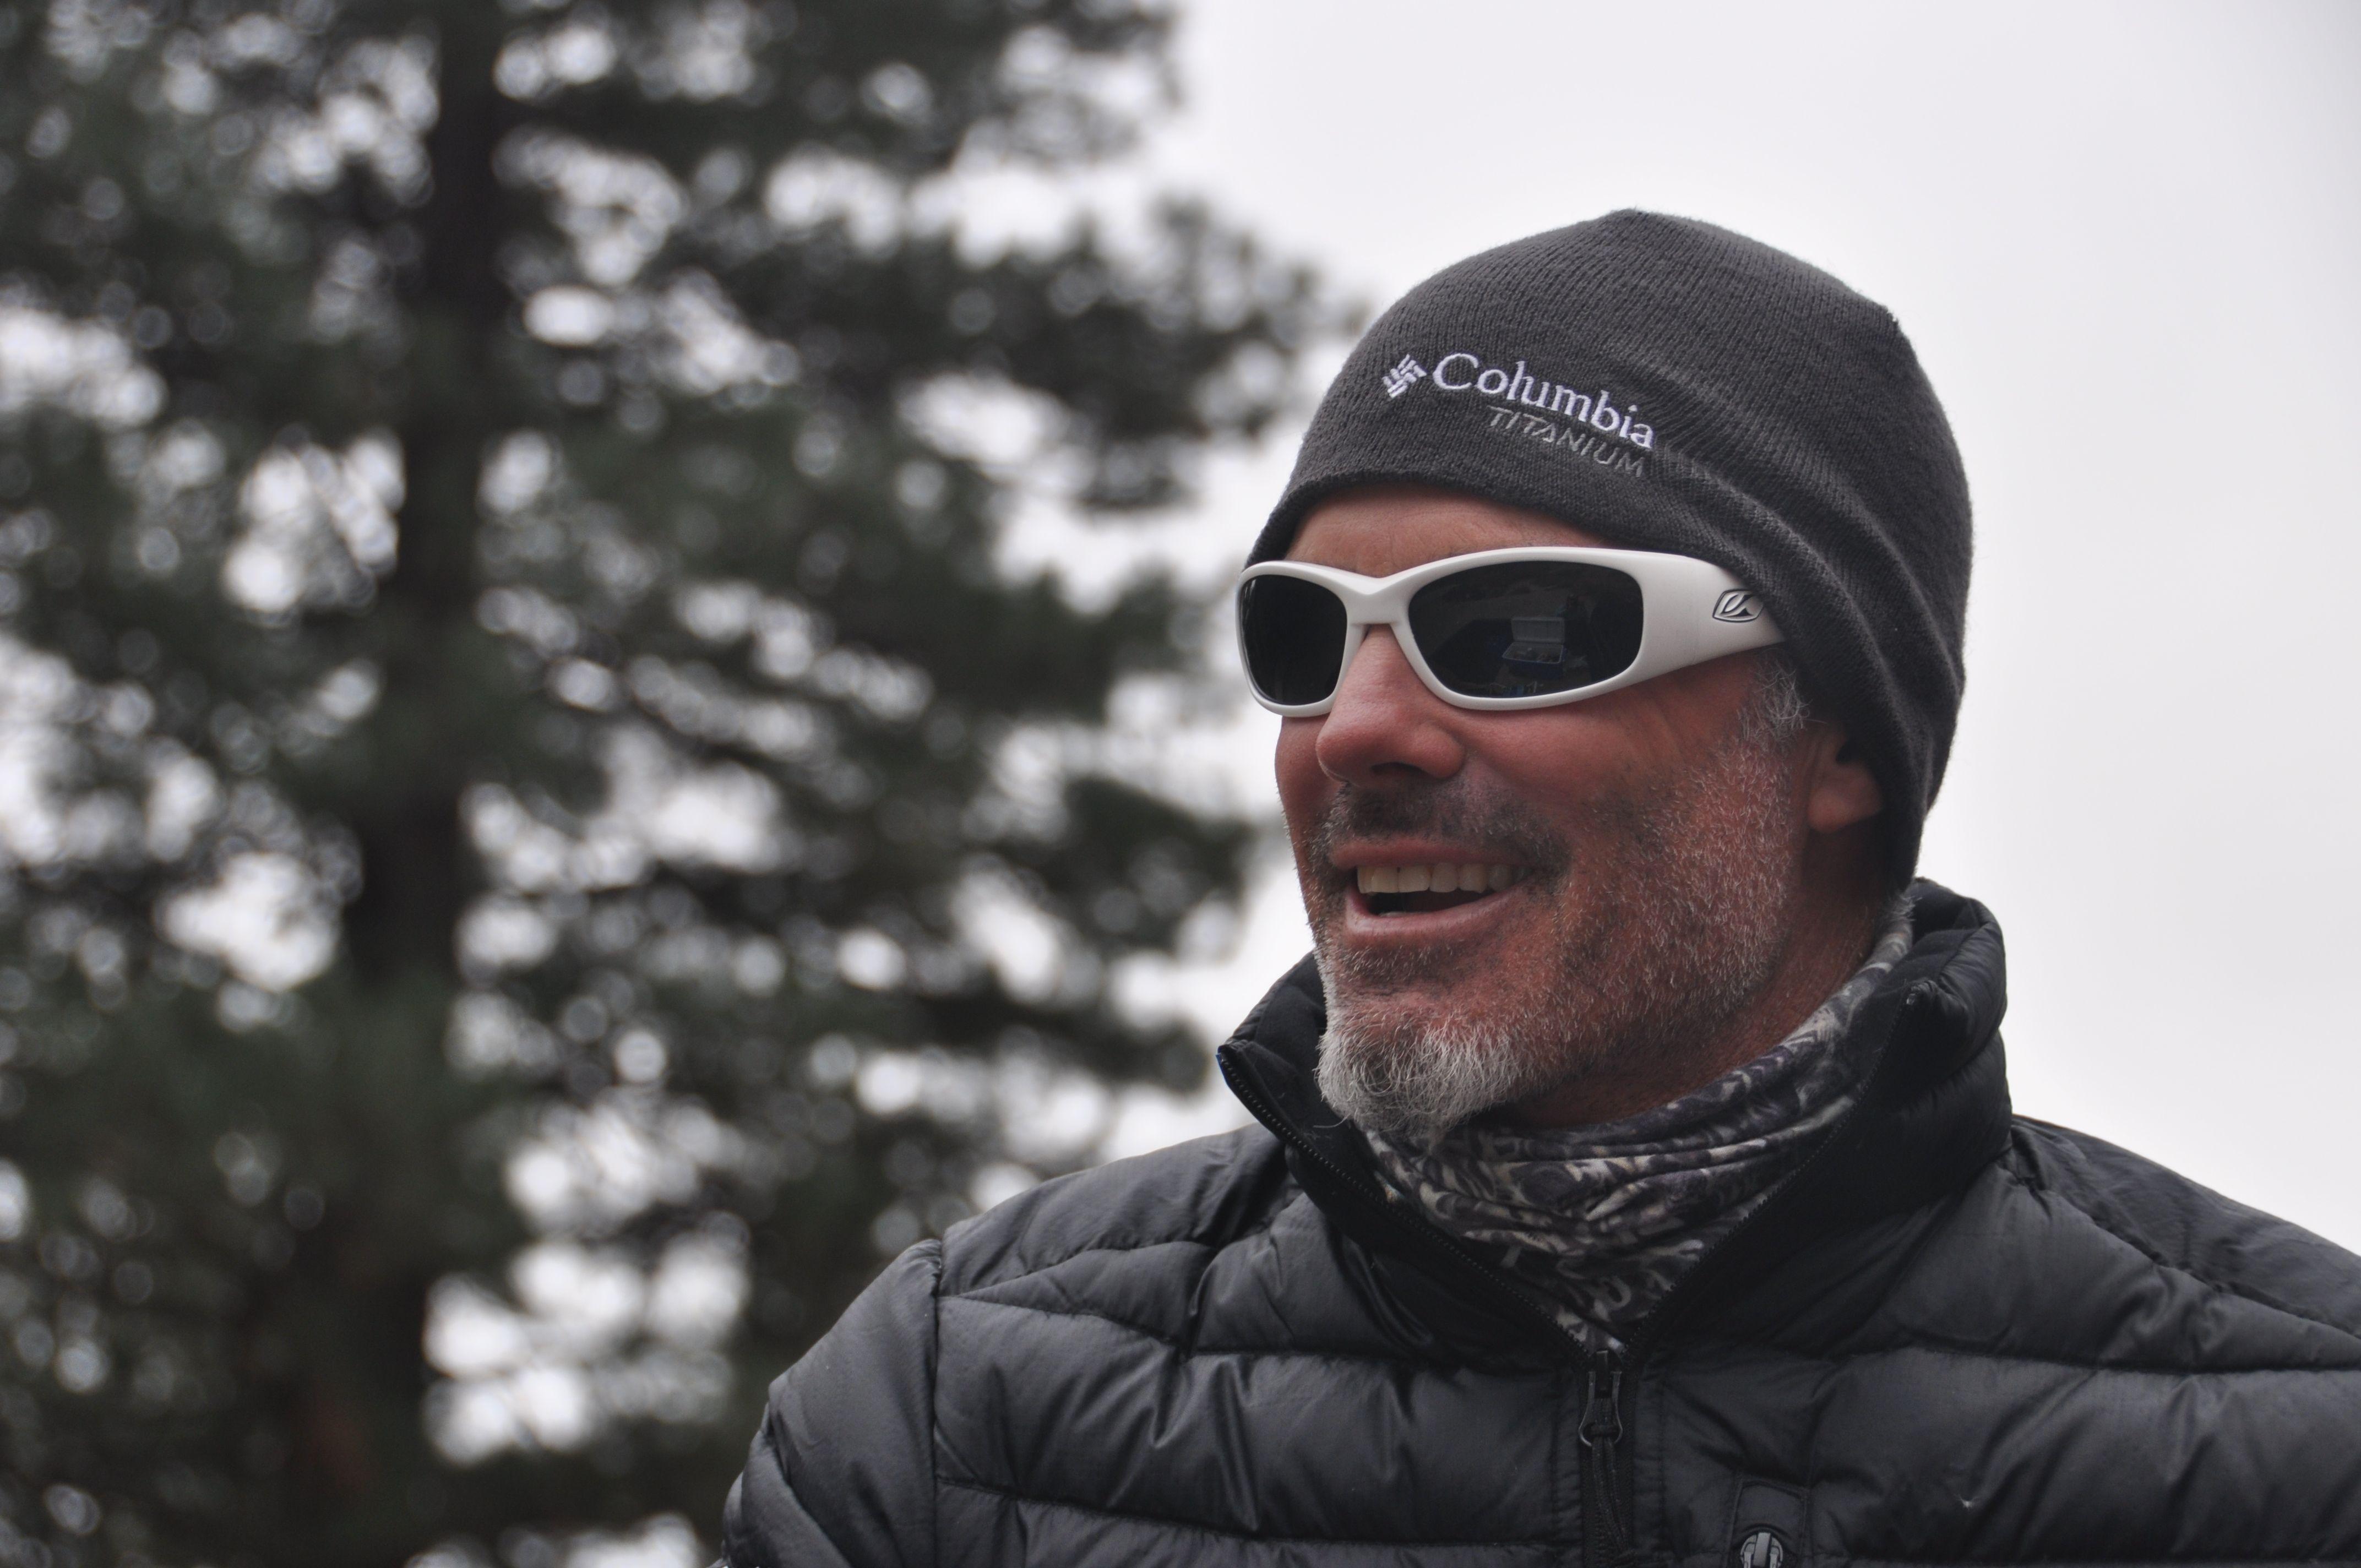 Kaenon mens sunglasses - Conway Bowman Fishing Kaenon Rhino Sunglasses Kaenon Fishing Sunglasses Outdoors